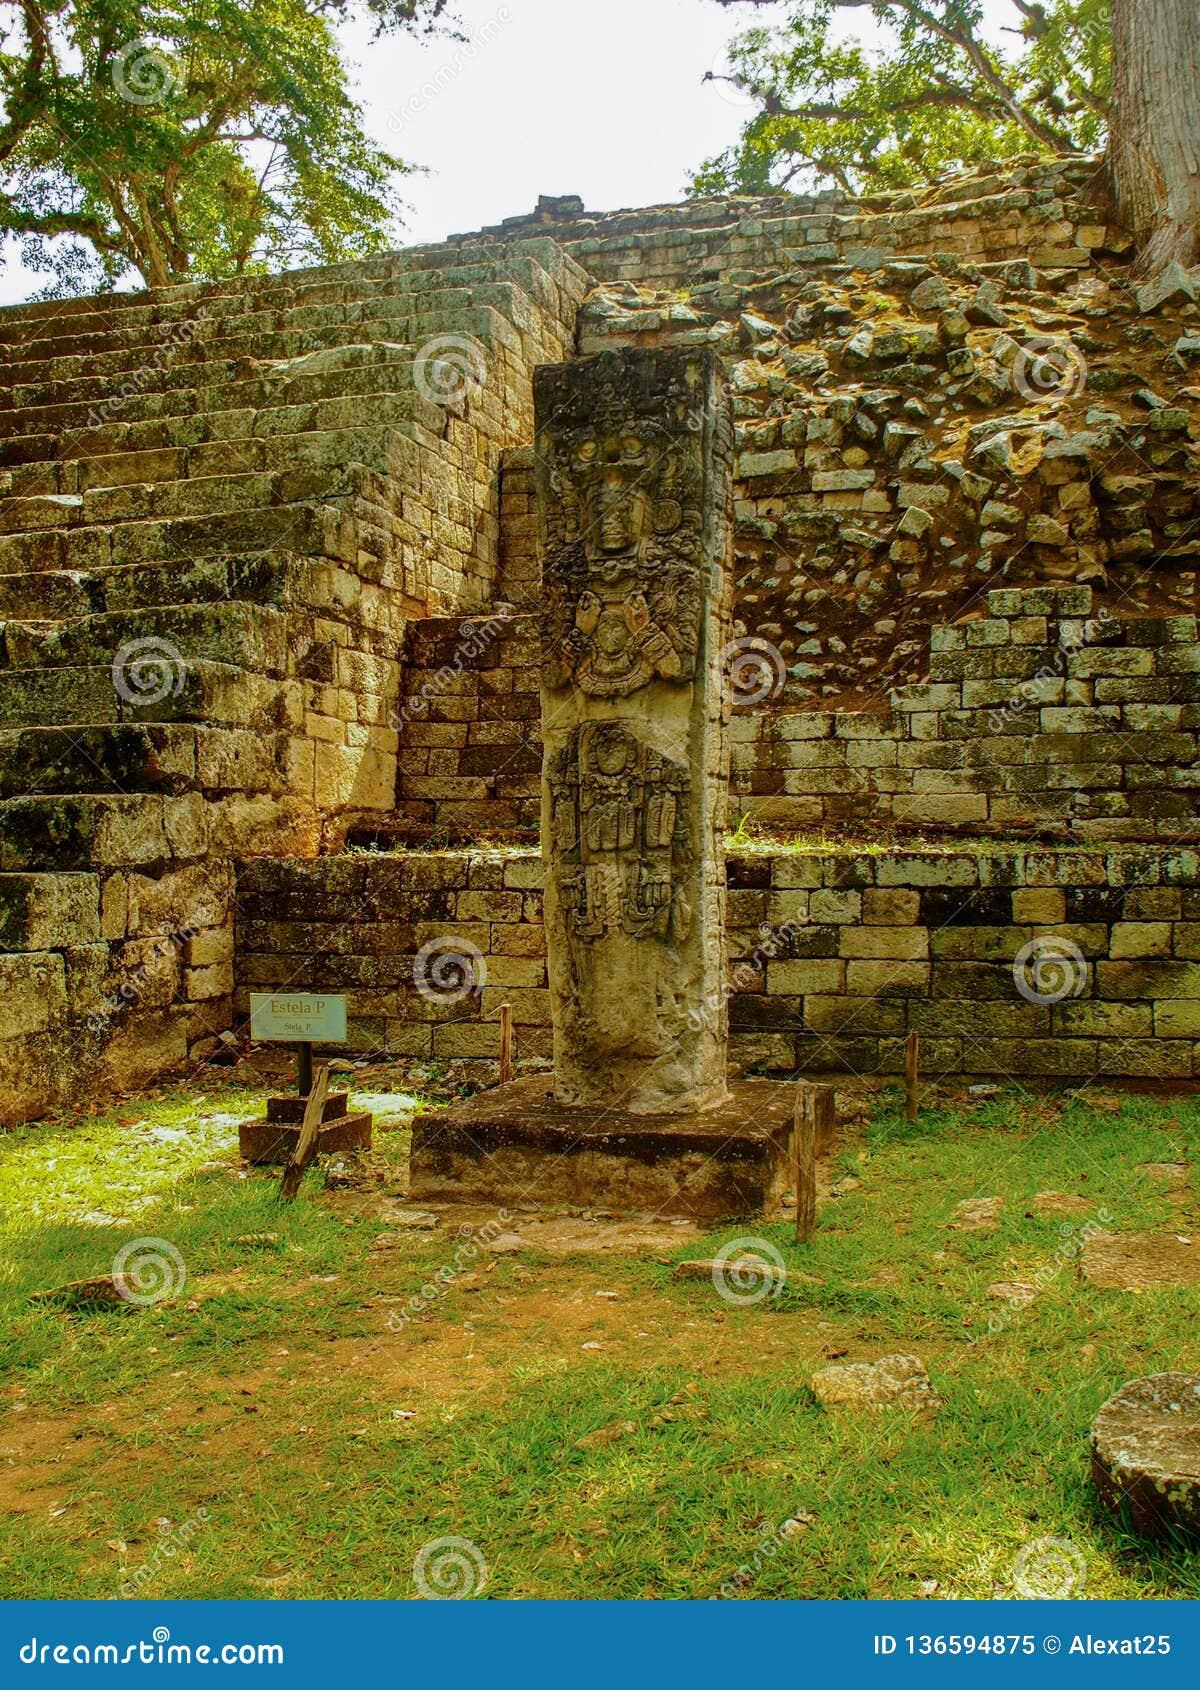 Archeological site of Copan in Honduras